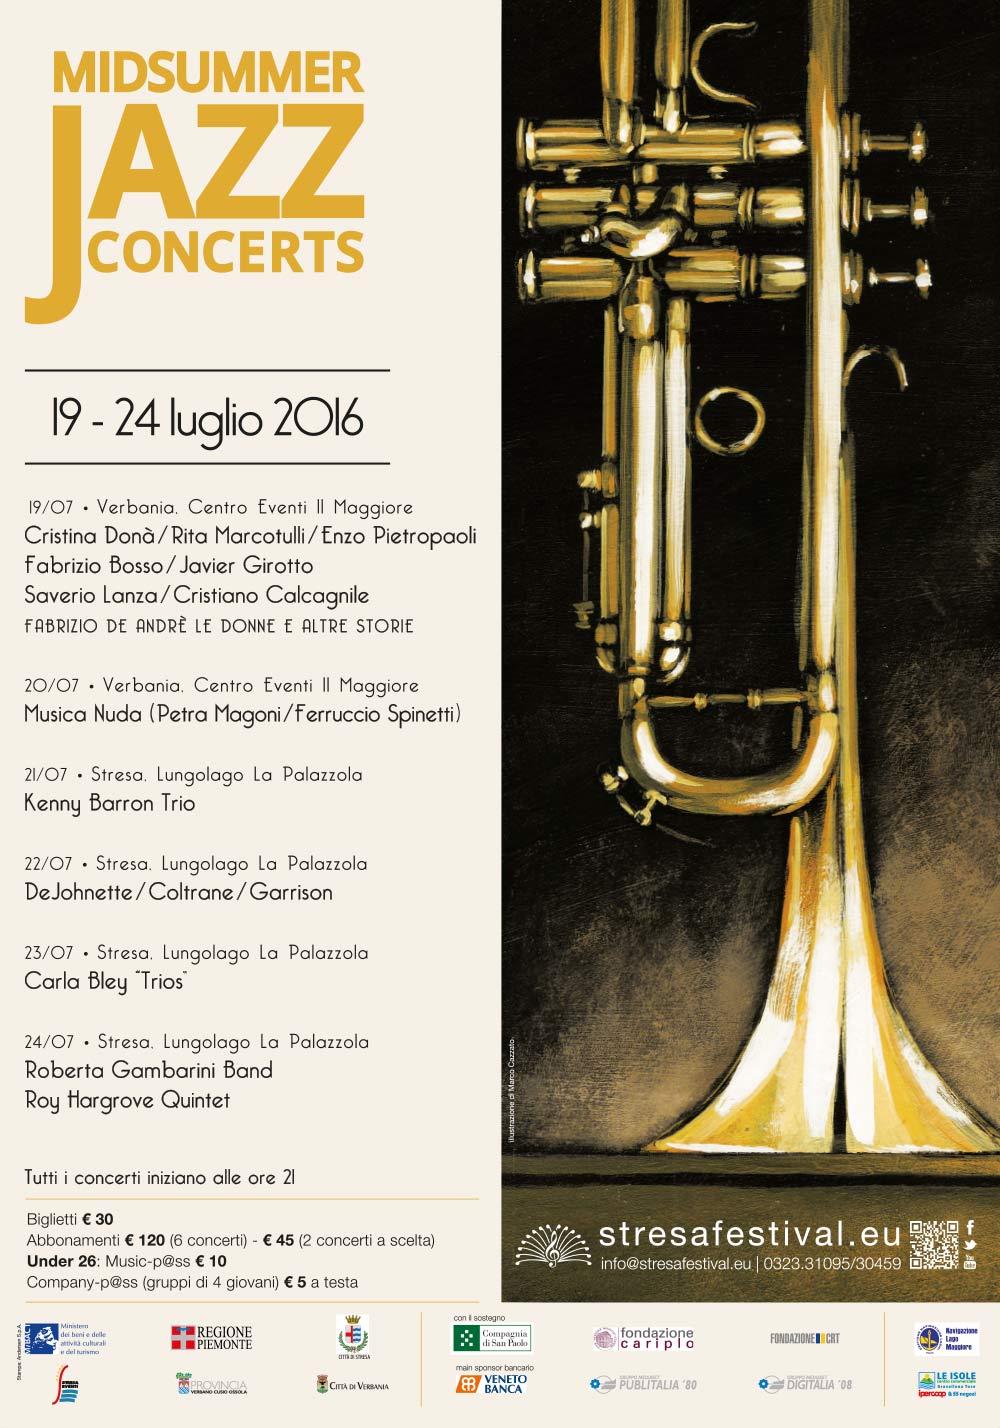 Stresa-Festival-locandina jazz 2016